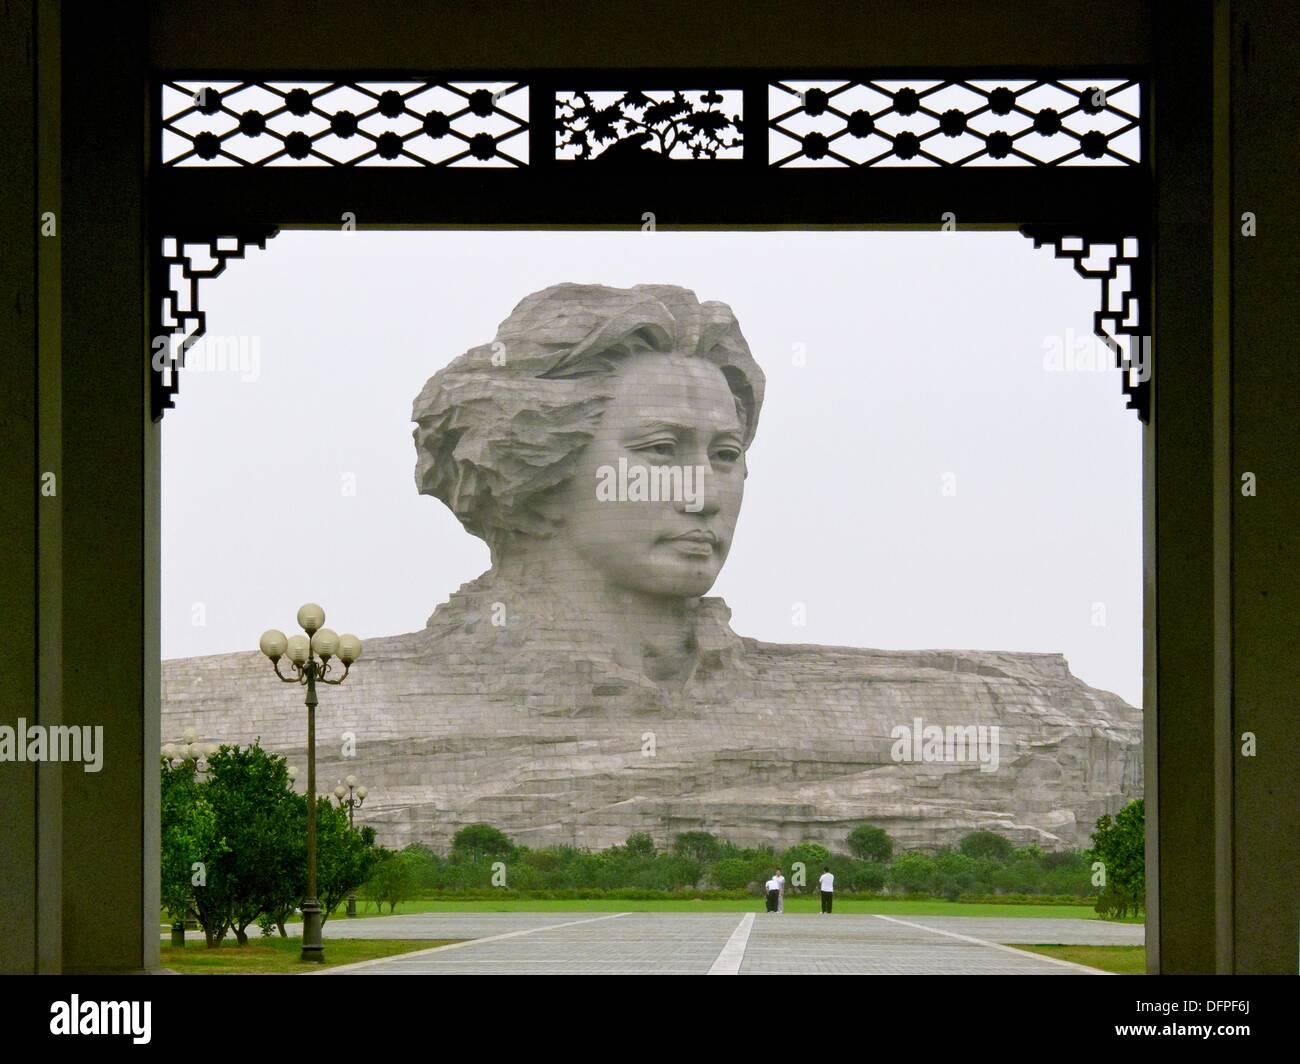 Chairman Mao's youthful sculpture can be seen at Orange Island, Changsha, Hunan, China. - Stock Image